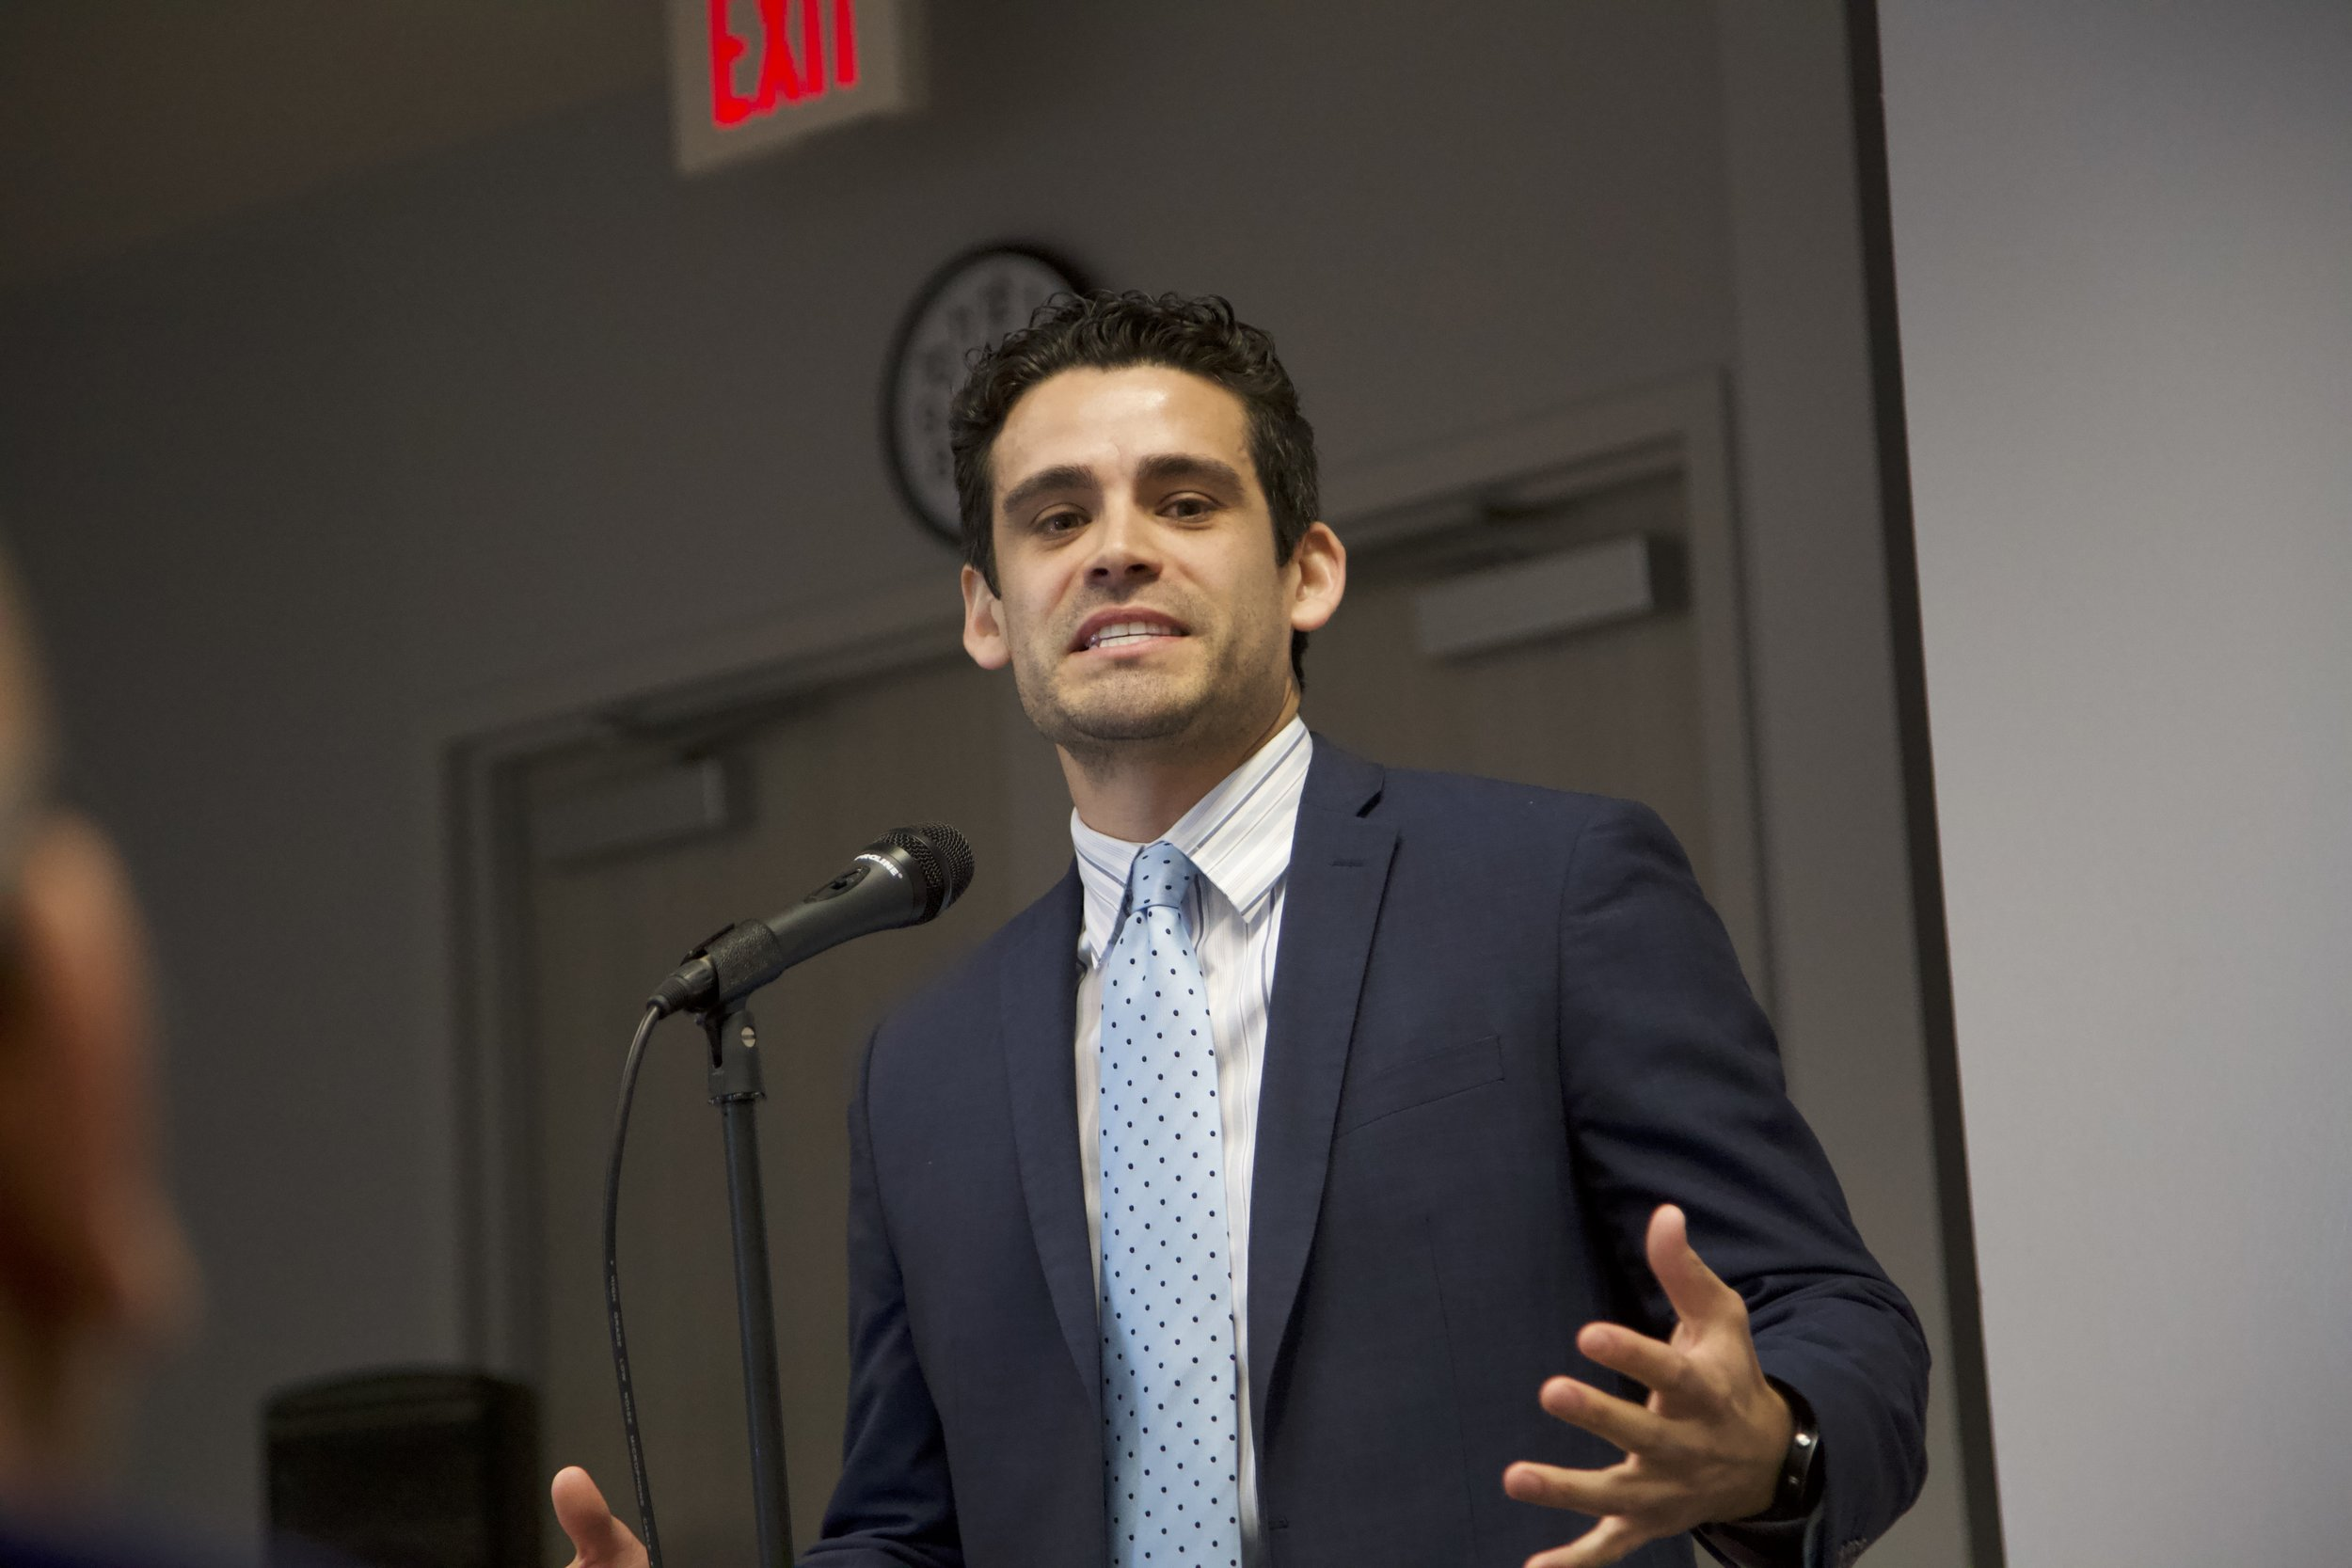 Mario Adame